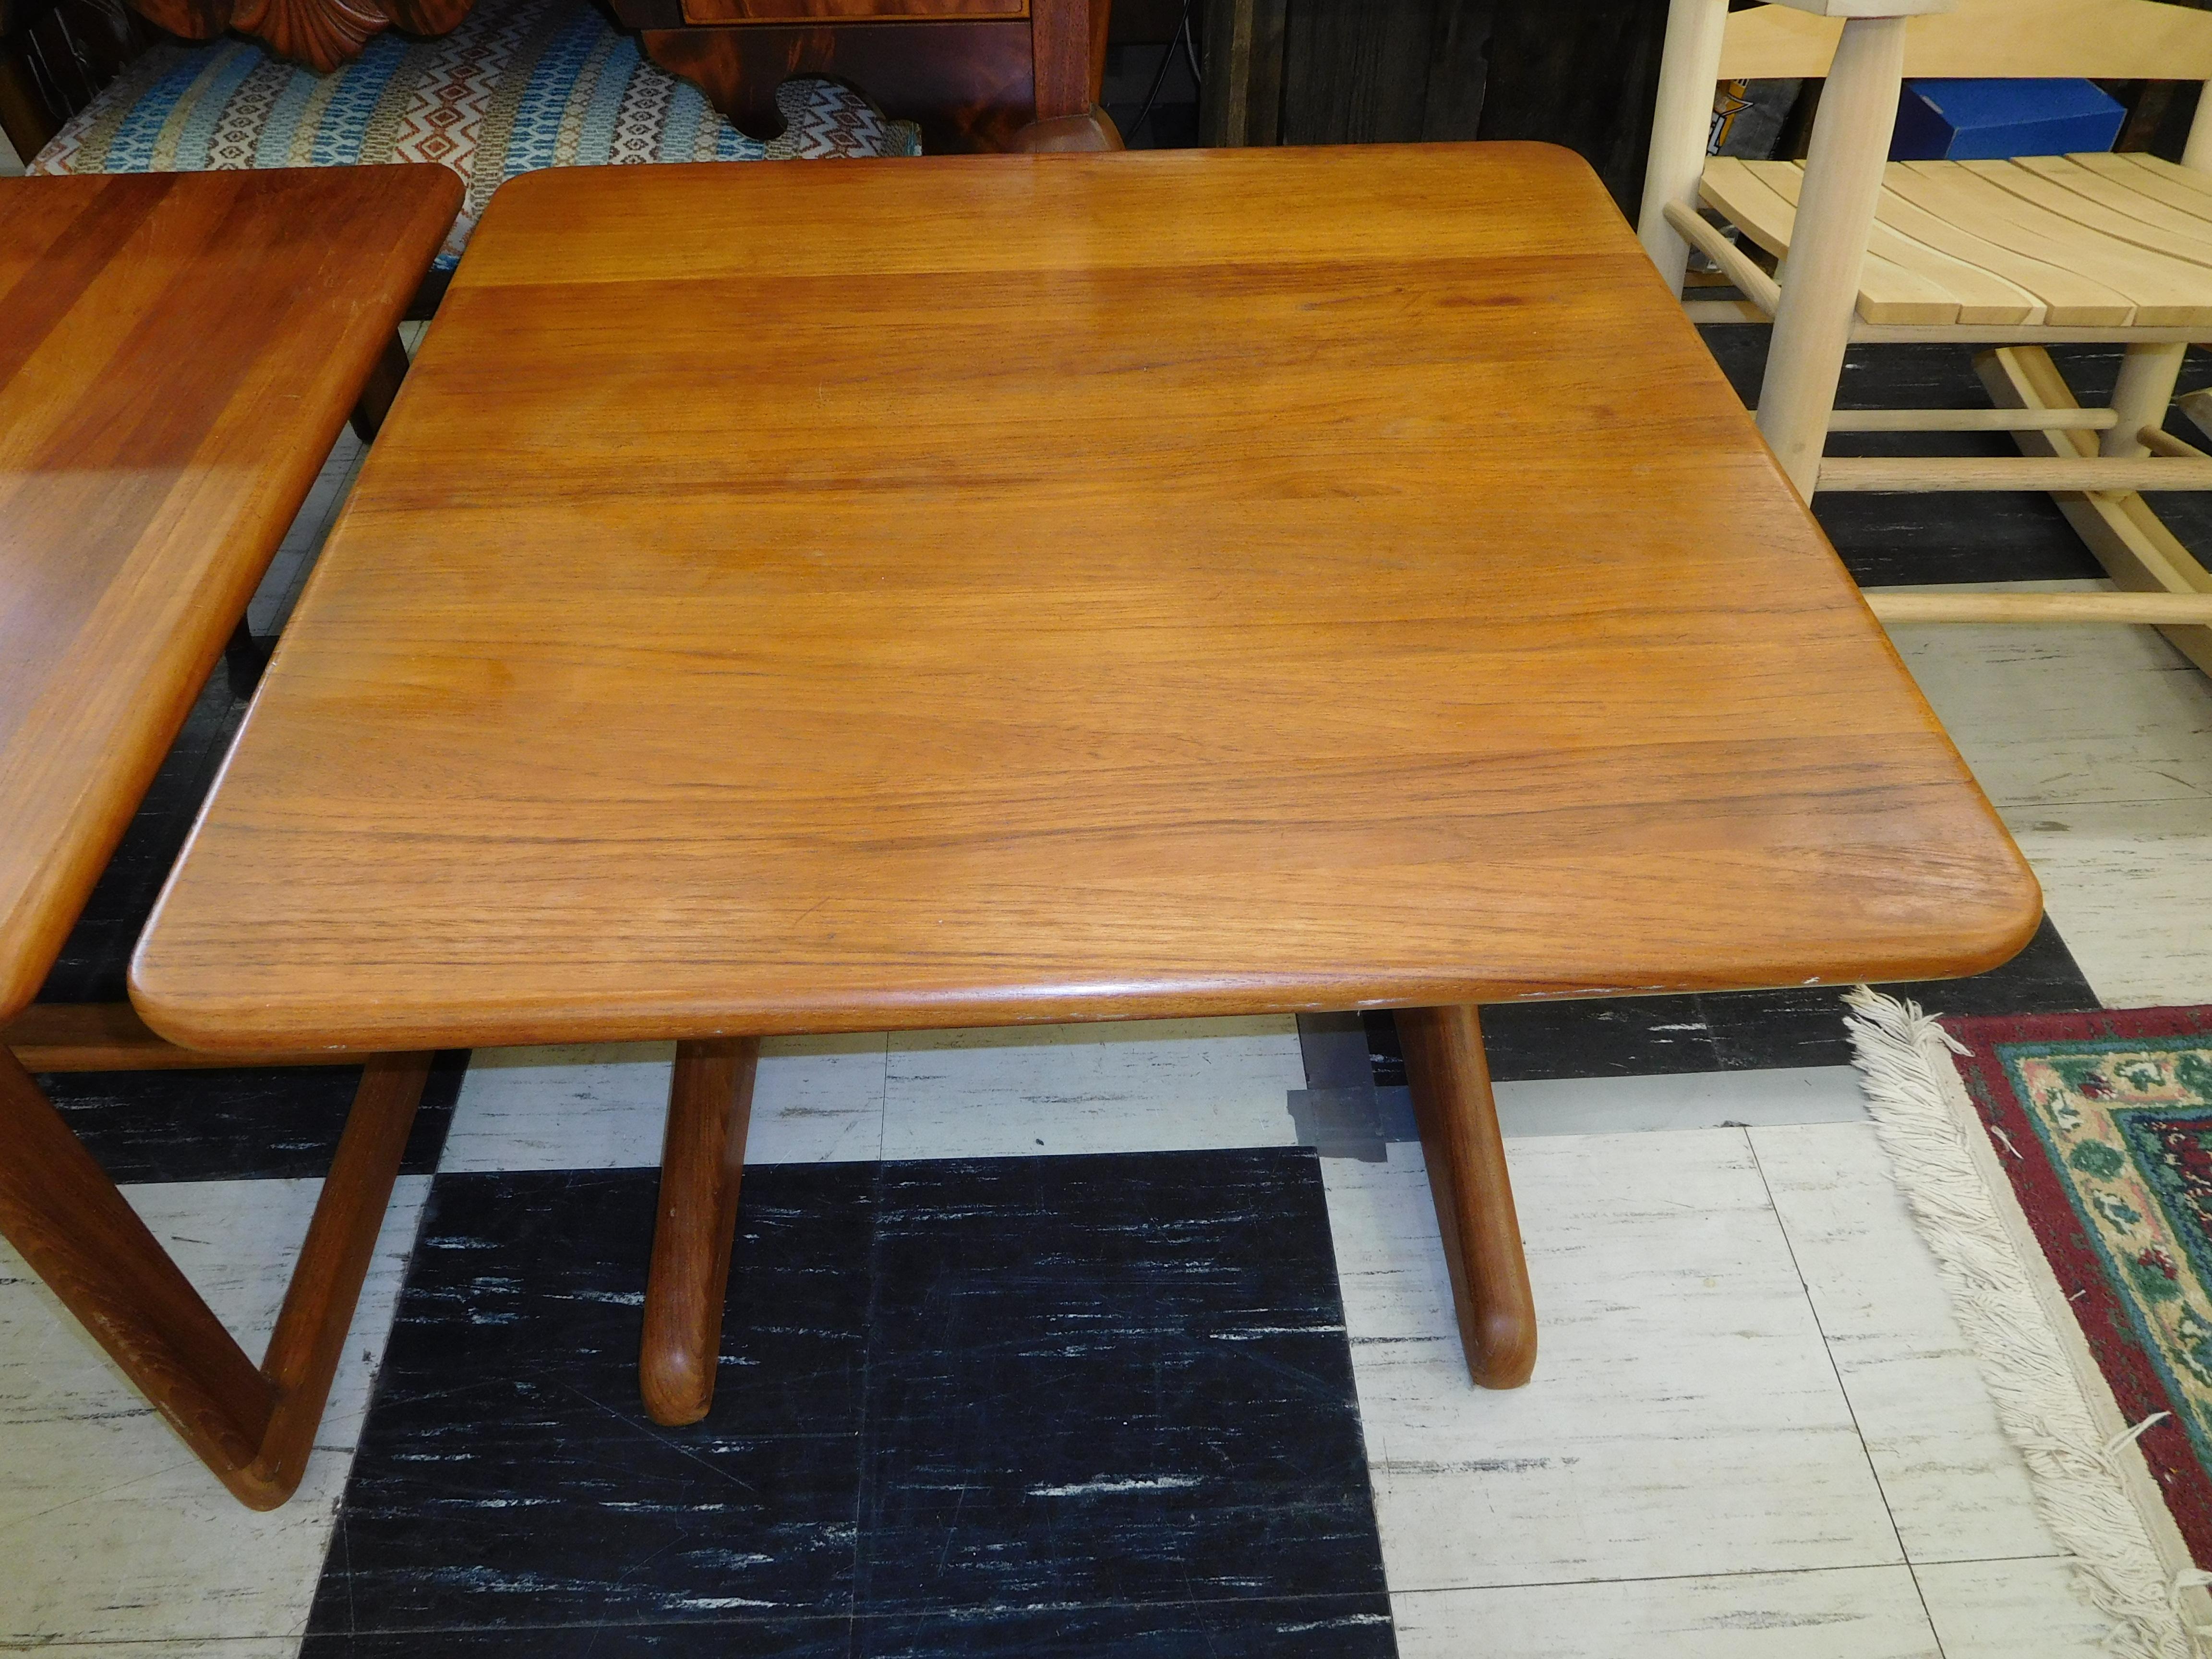 Mid Century Danish Teak End Table with Trestle Base